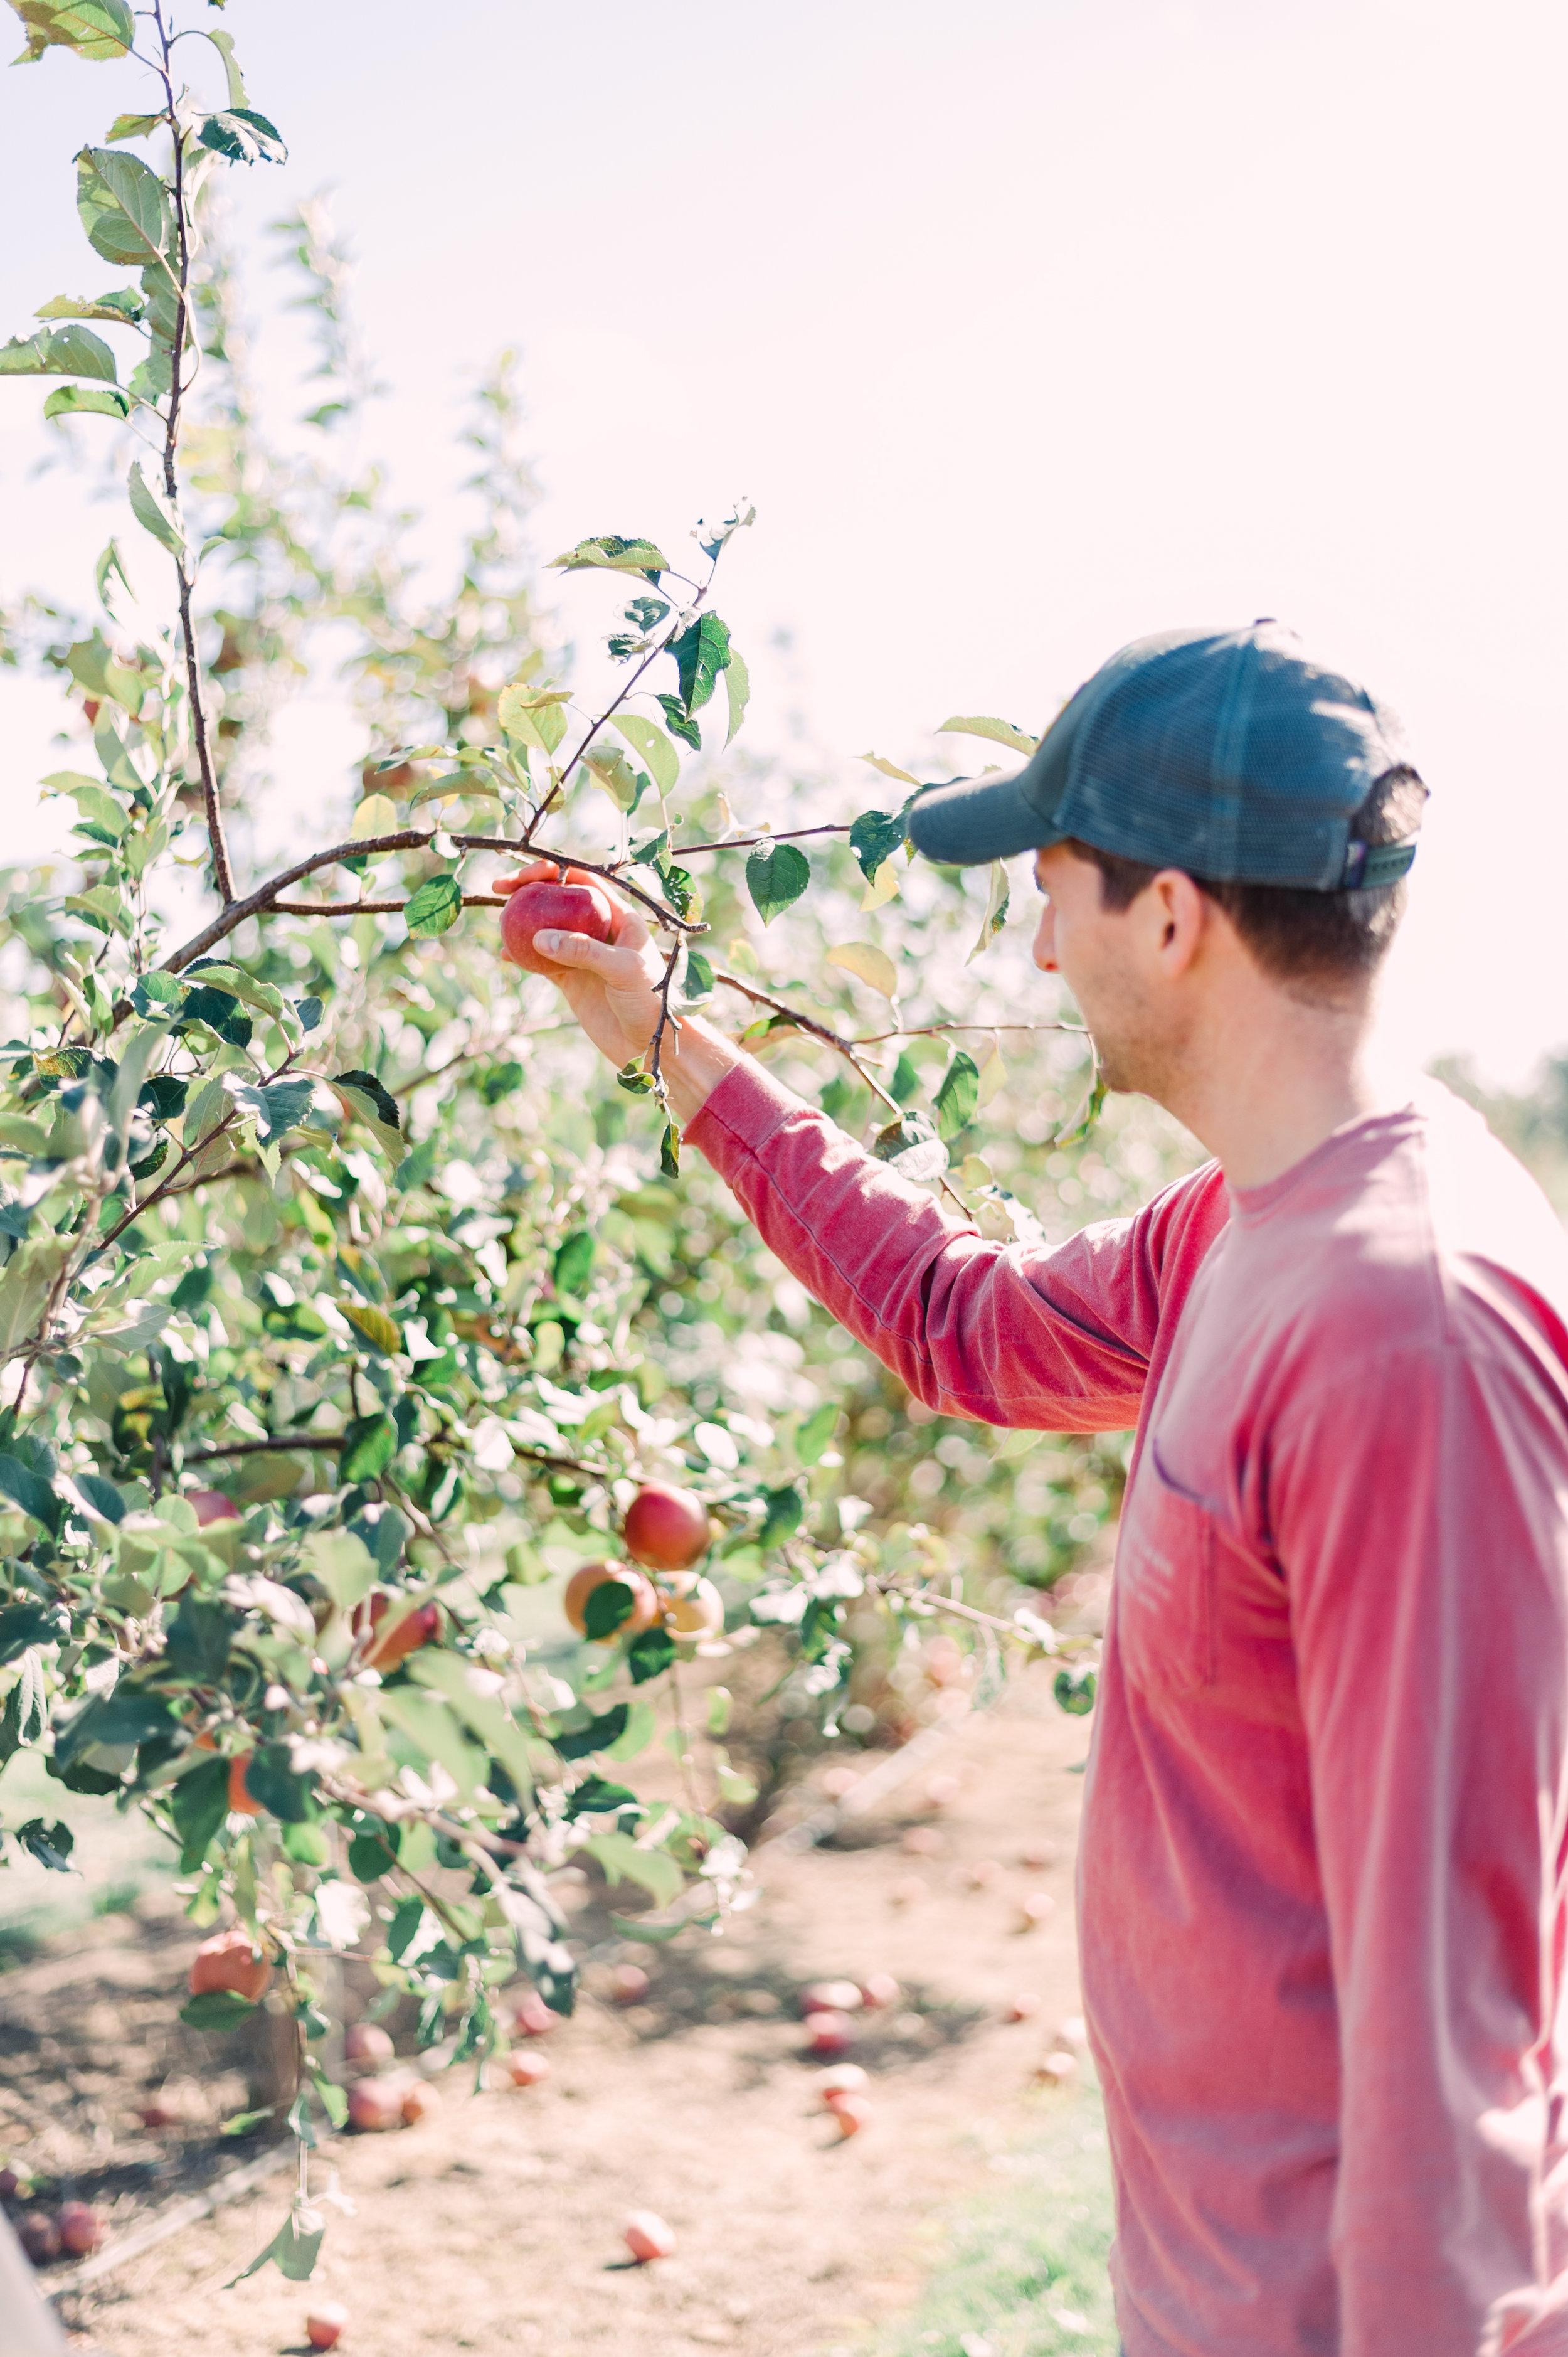 Fall October Huber's Orchard -2.JPG